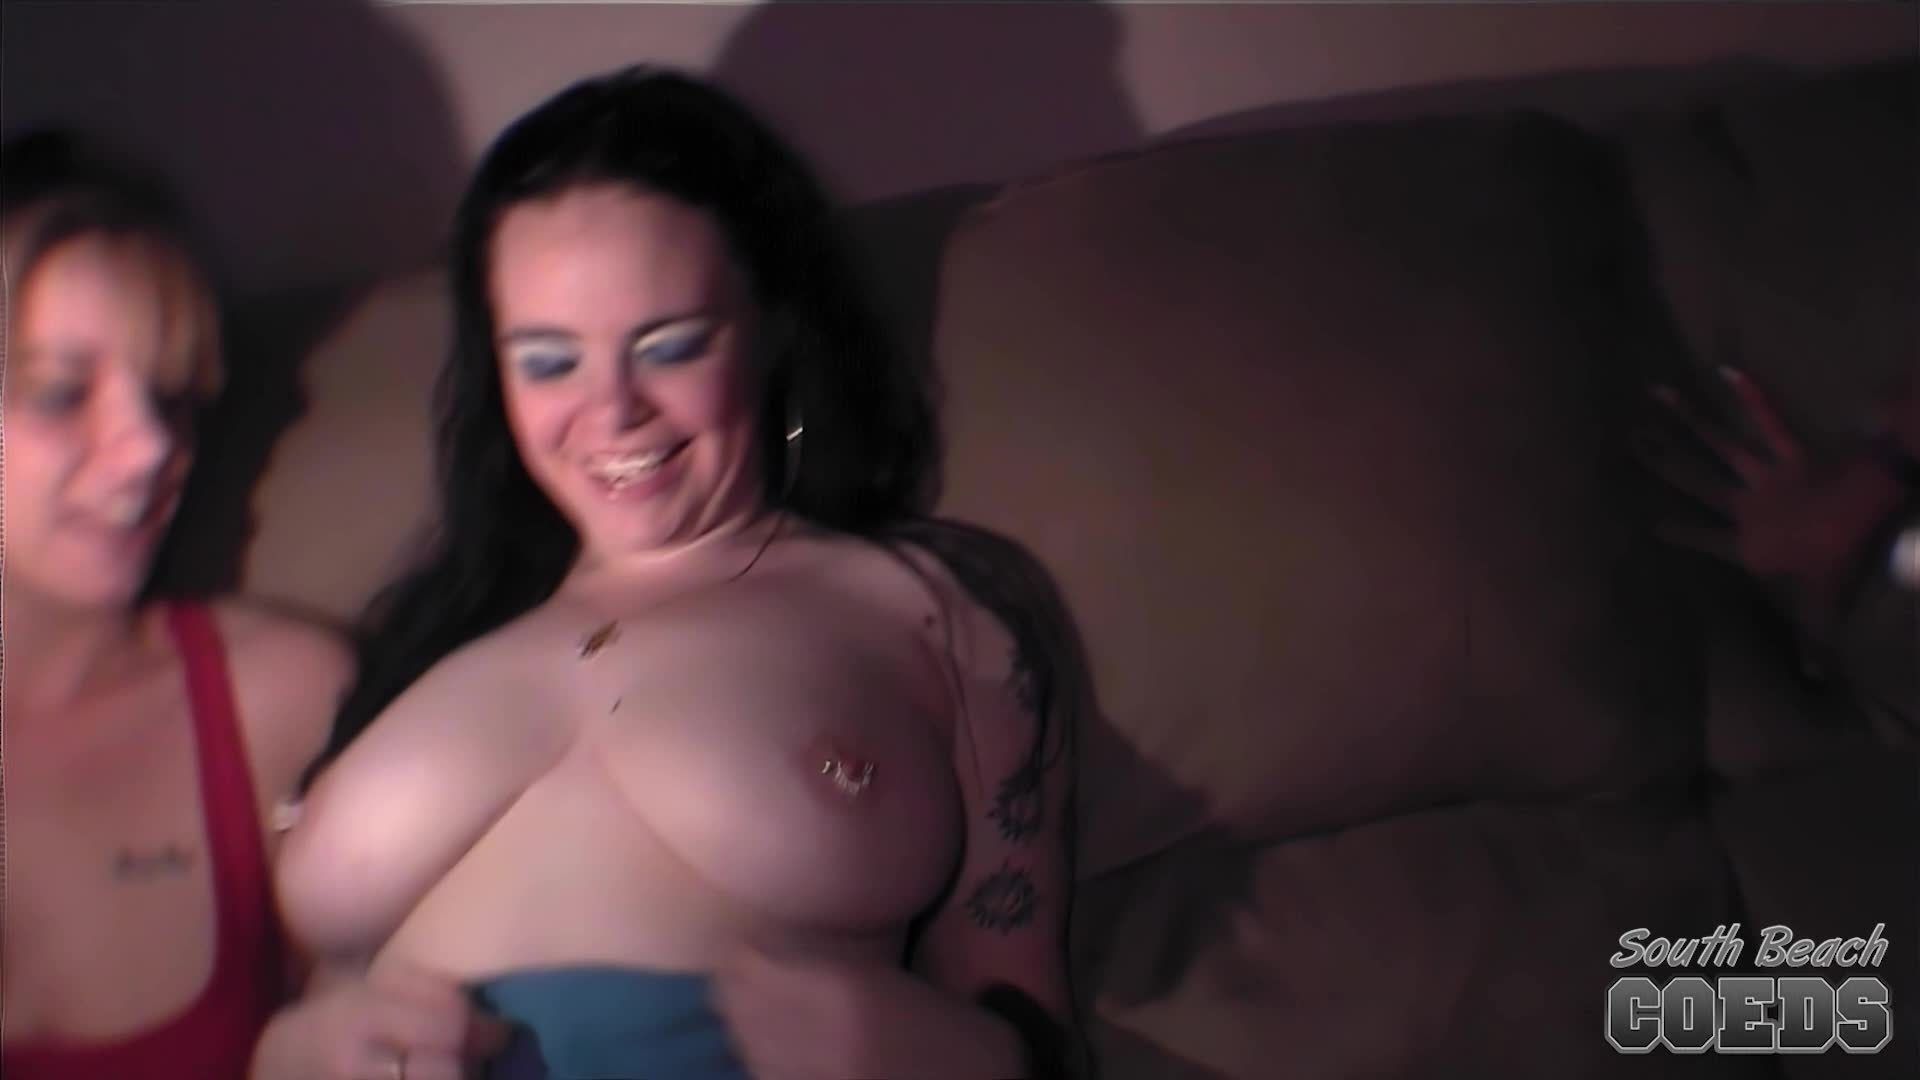 College Sex Contest Porn Videos at PussySpacecom